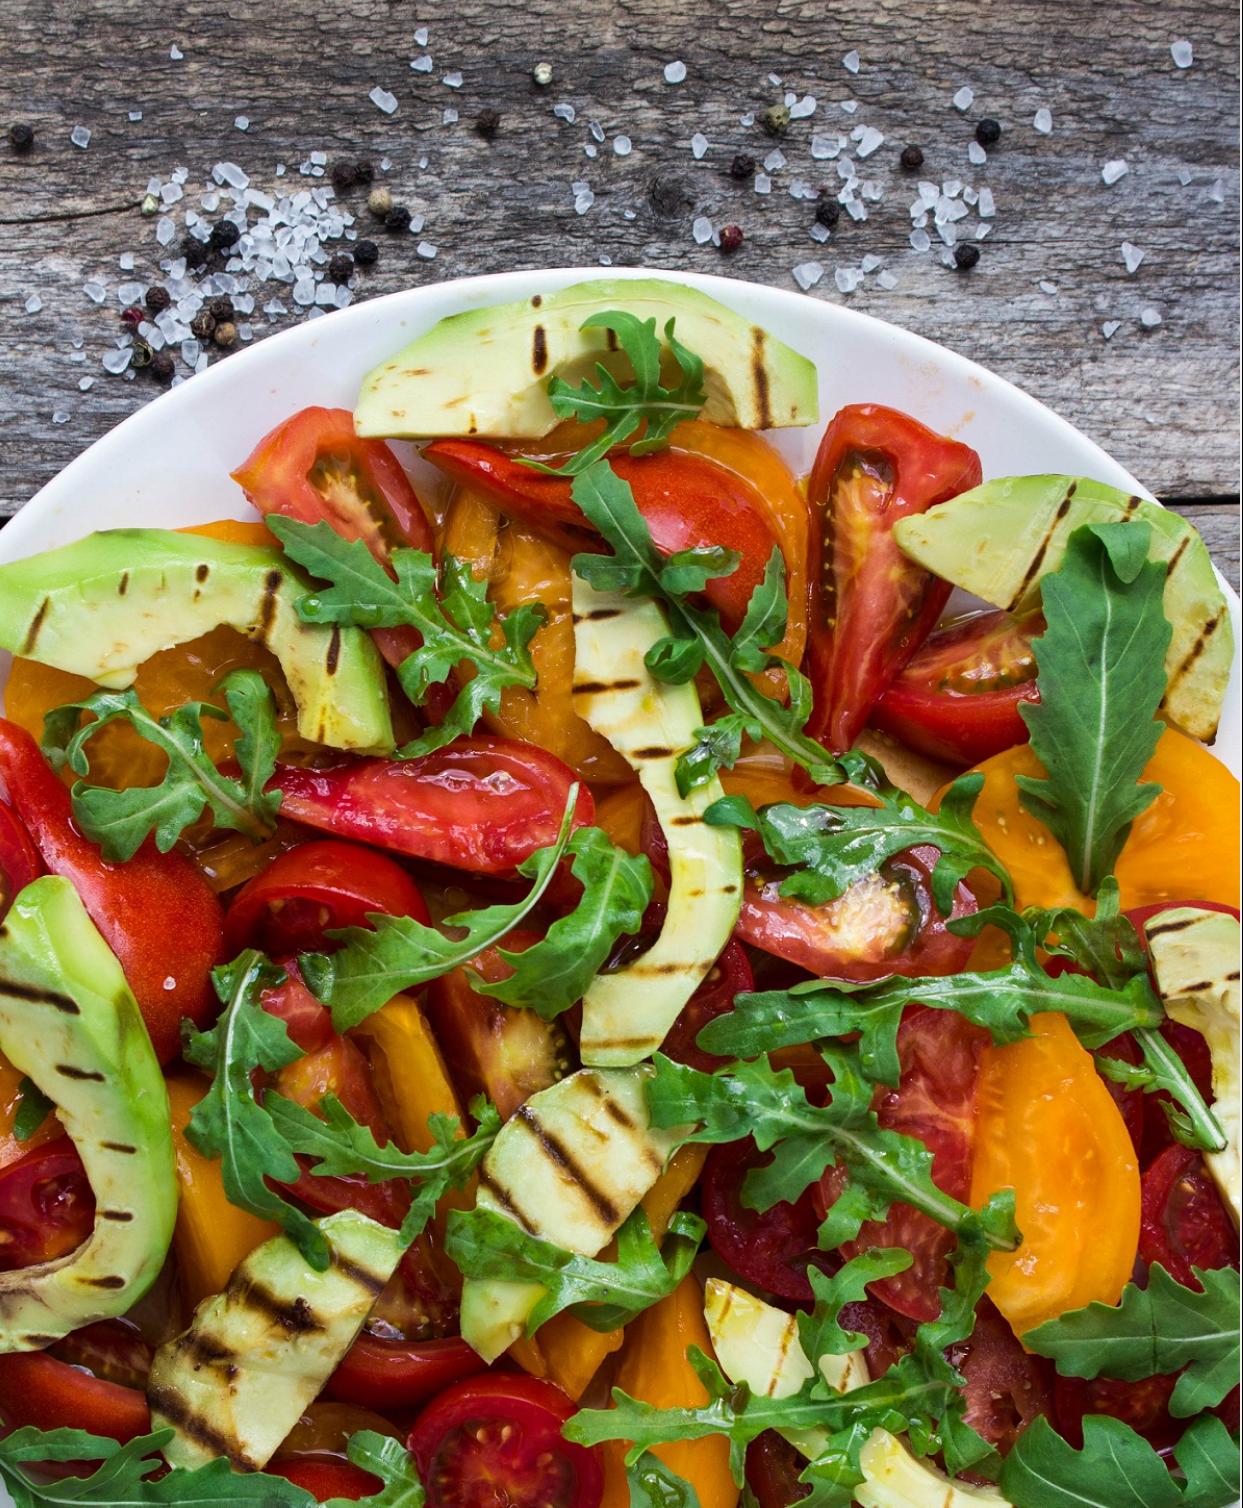 Arugula salad with roasted avocado and tomato